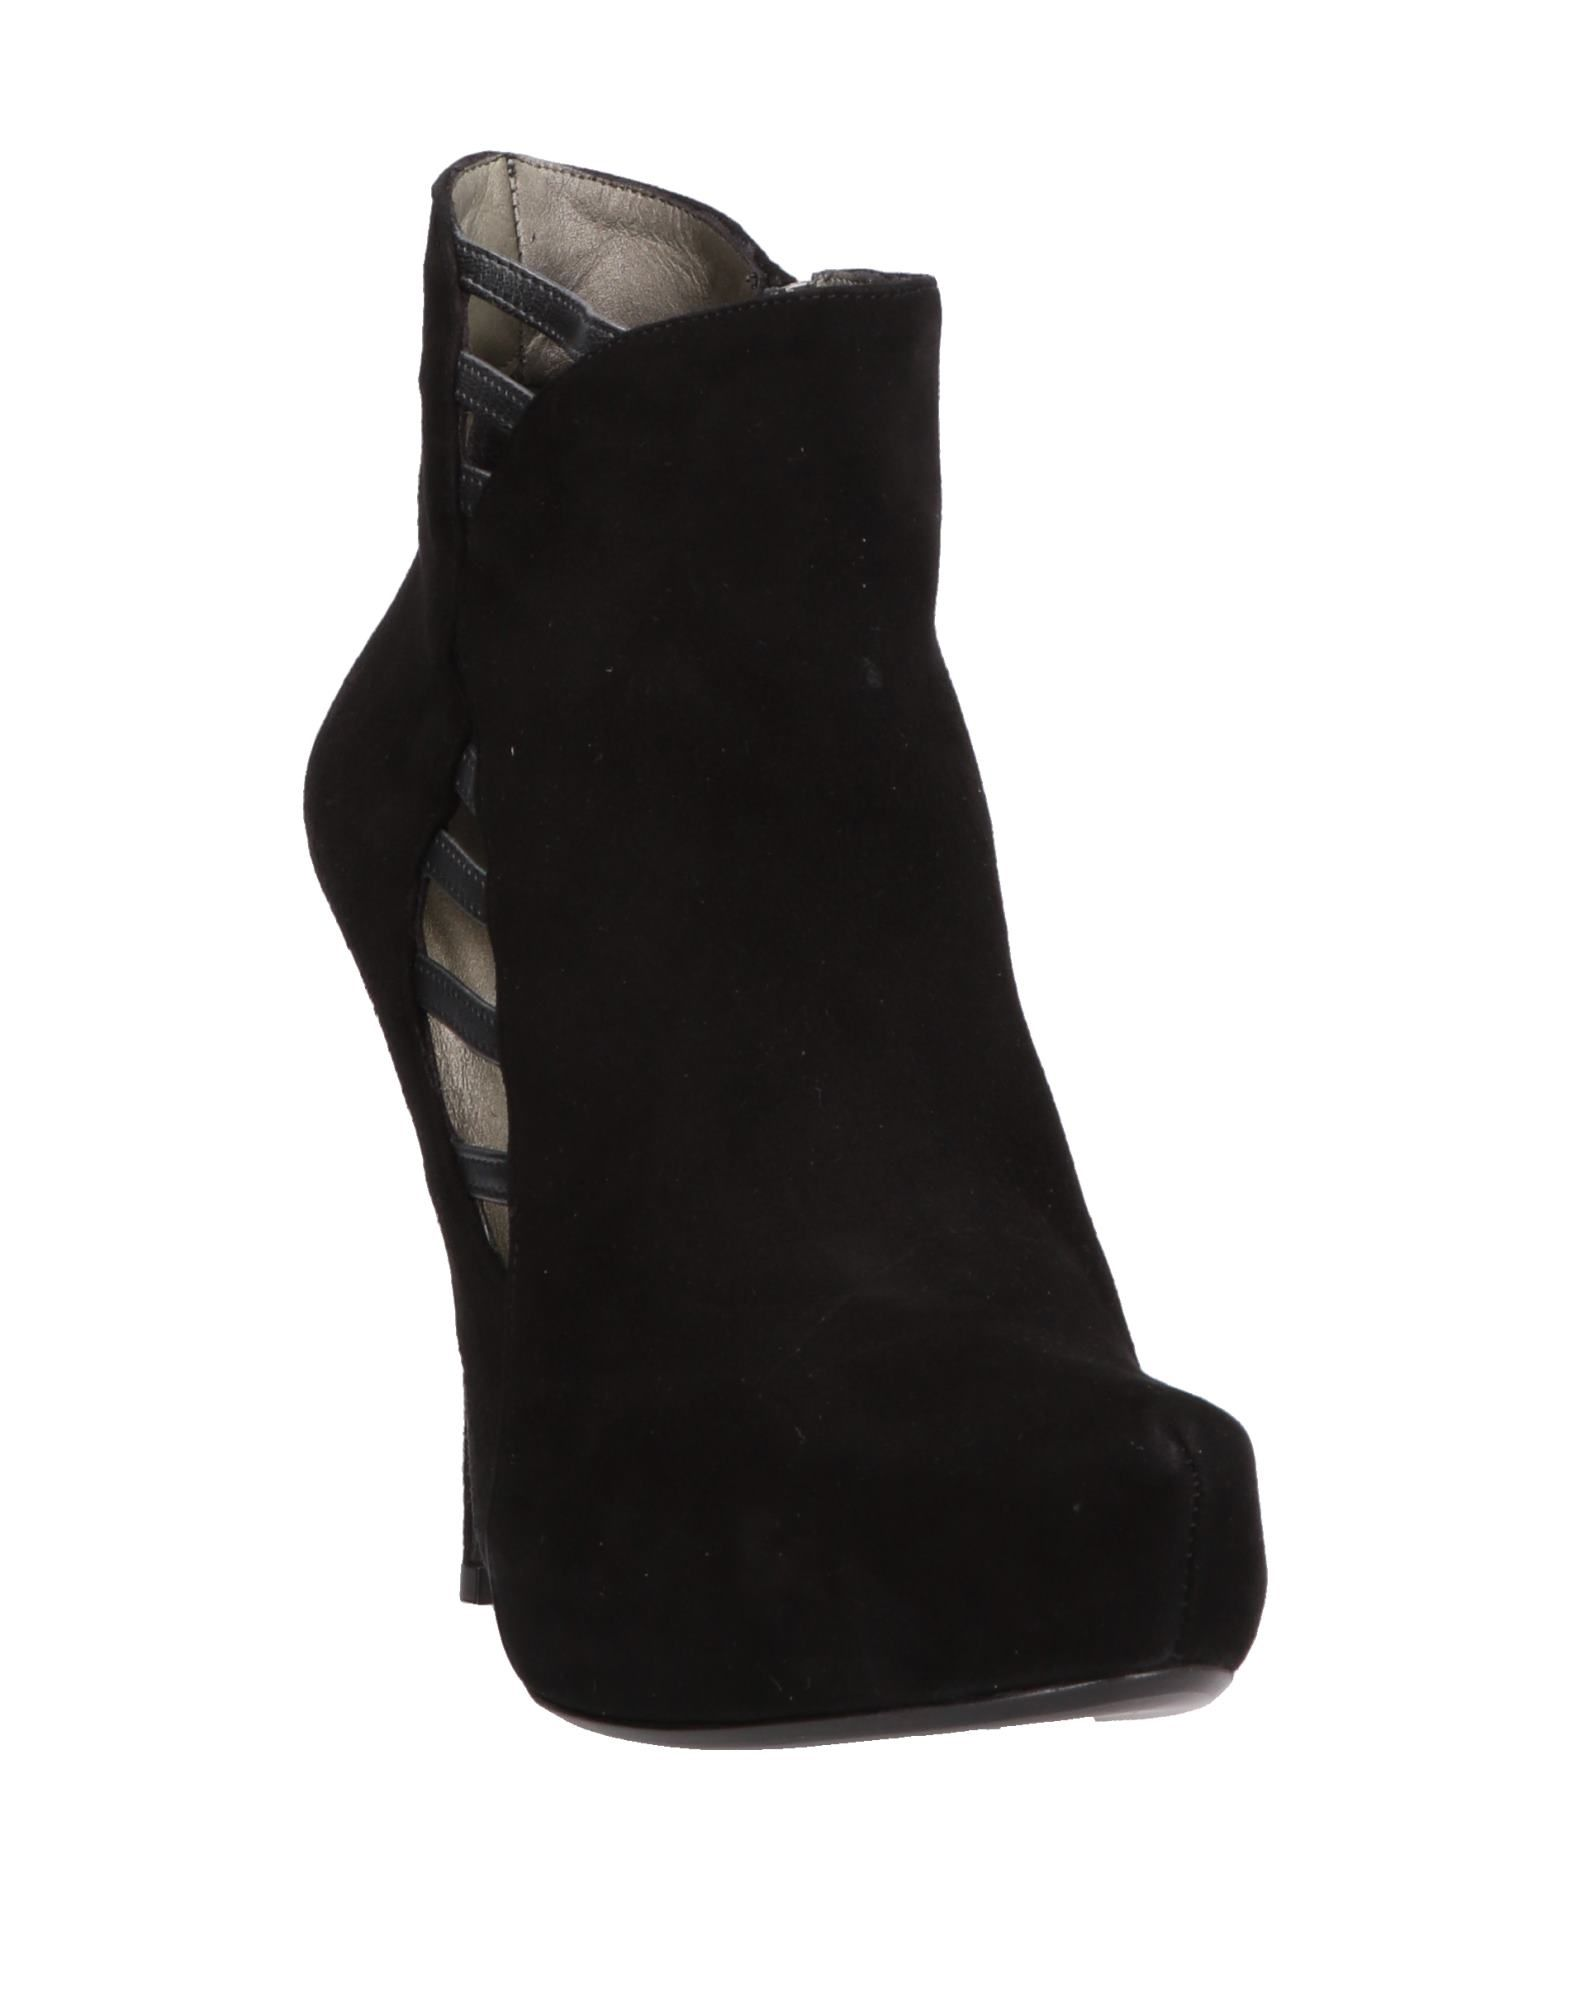 Stilvolle billige Schuhe Aldo  Castagna Stiefelette Damen  Aldo 11548340EA d9ad28